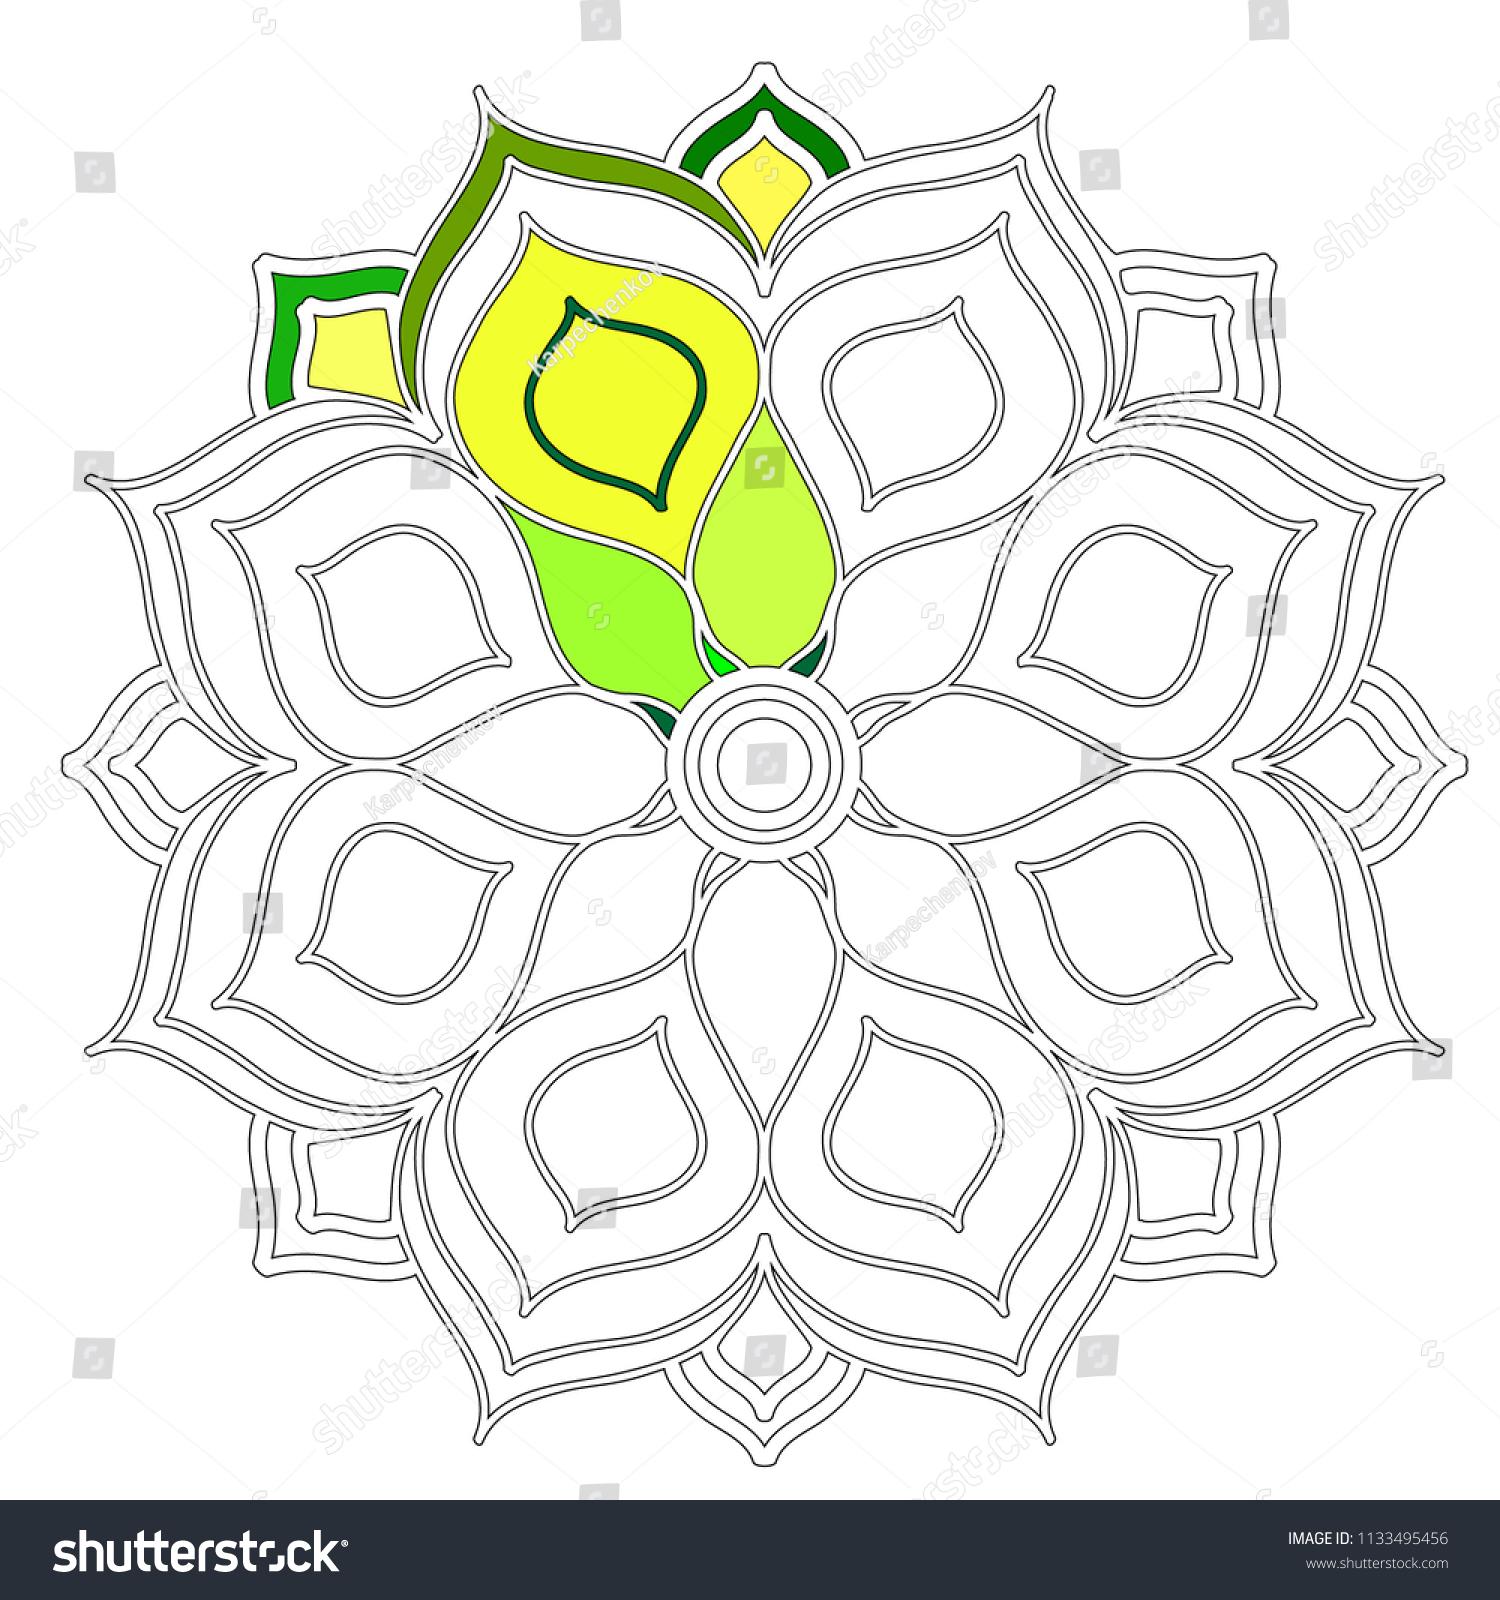 Mandalas Coloring Pages Kids Mandala Flower Stock Vector 1133495456 ...